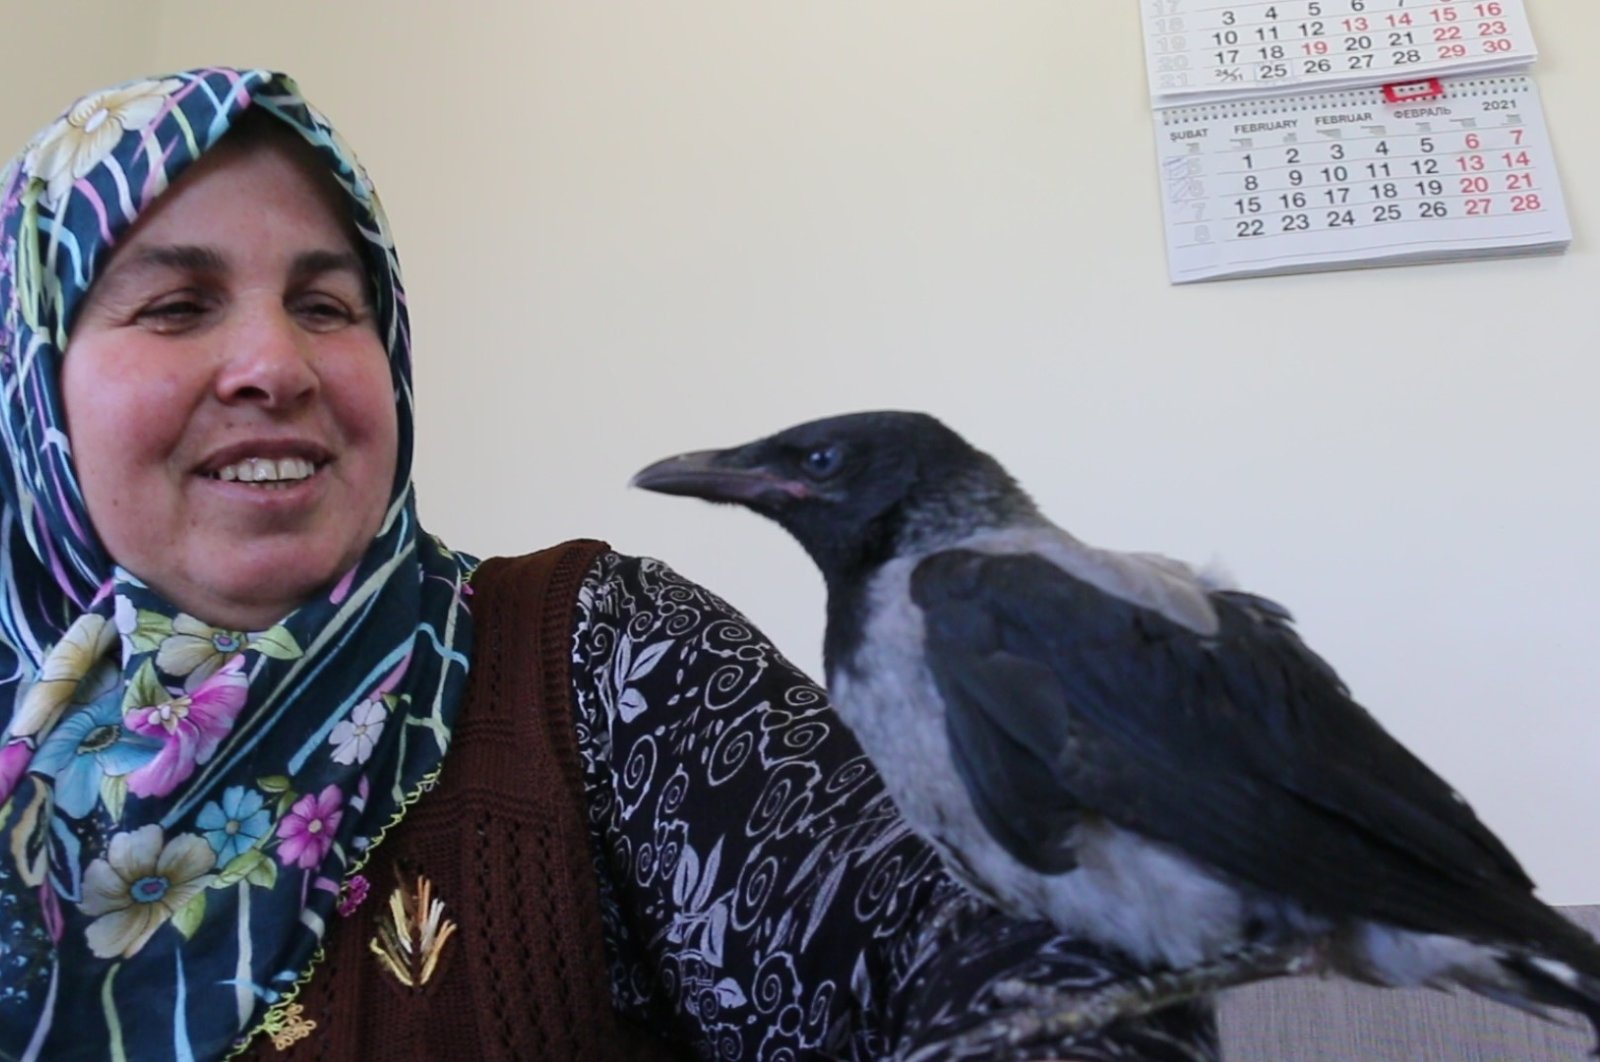 Fatma Yanıkoğlu poses with Hasan perched atop her arm, in Bolu, northern Turkey, May 26, 2021. (AA PHOTO)